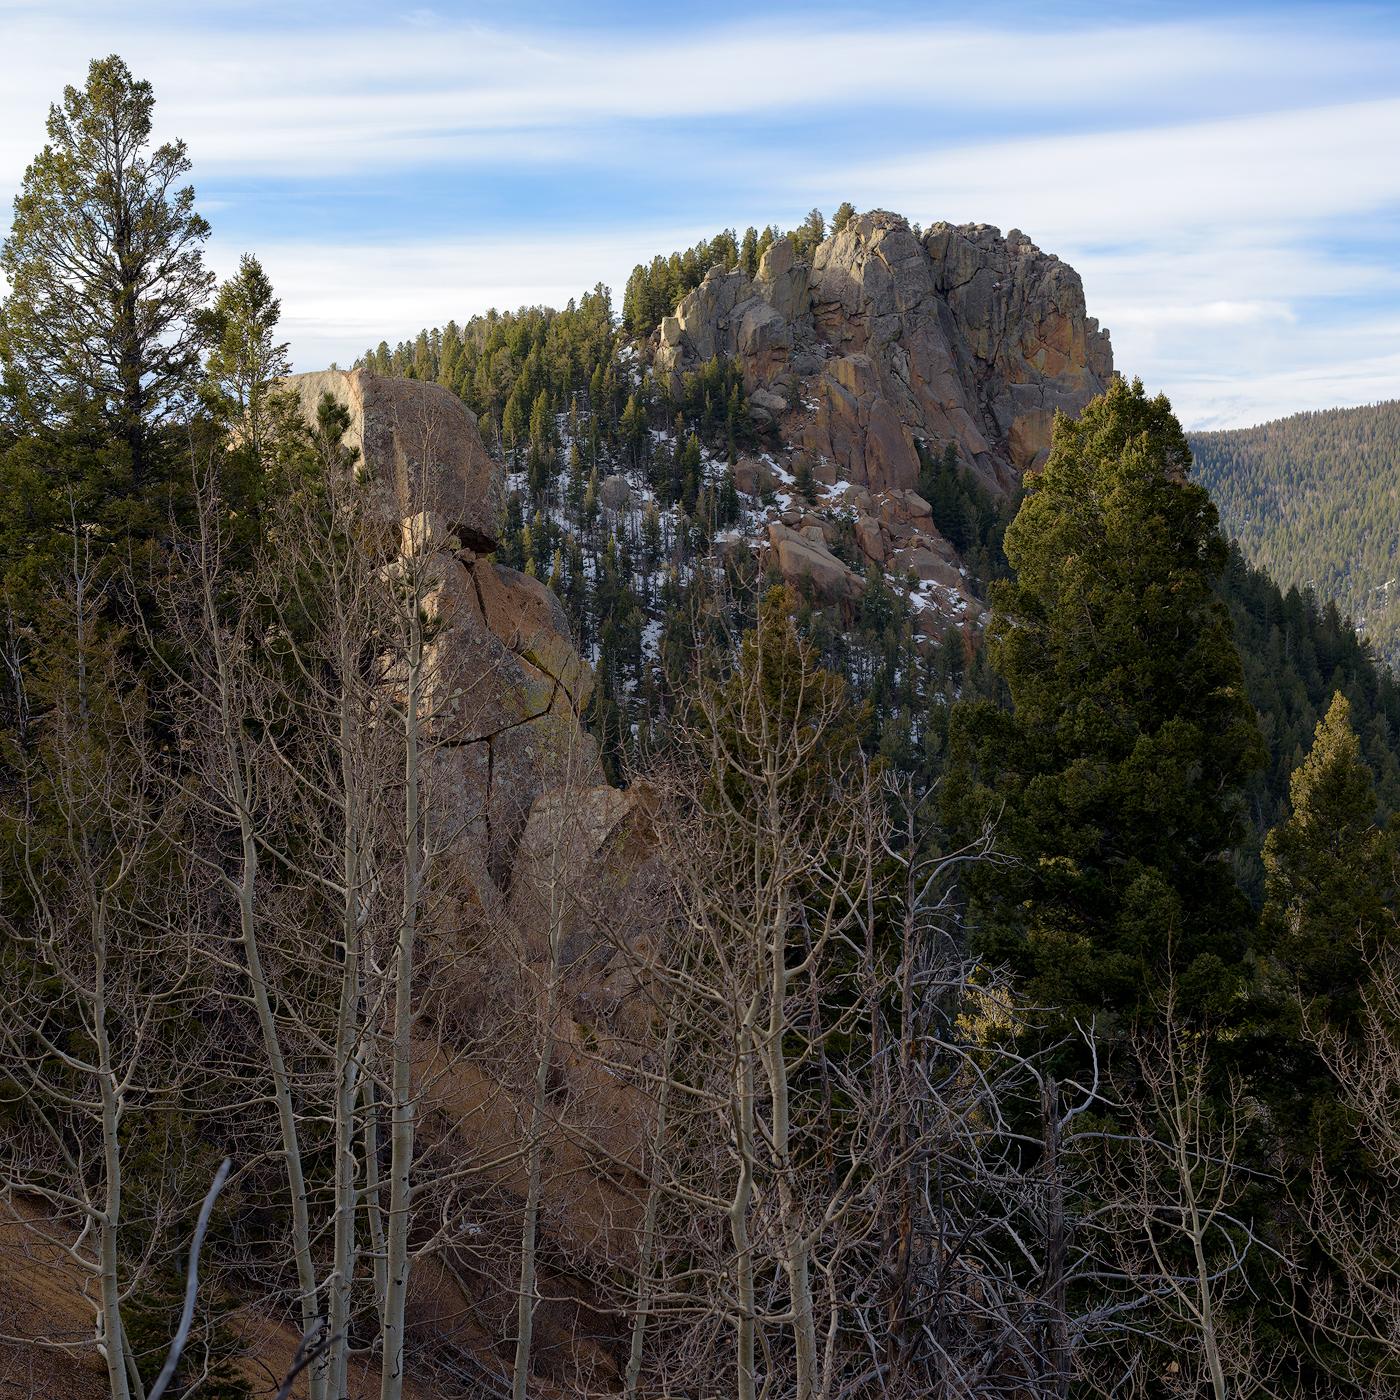 Photo by: Ryan Stikeleather Break Trail Photography (www.breaktrailphotography.com)